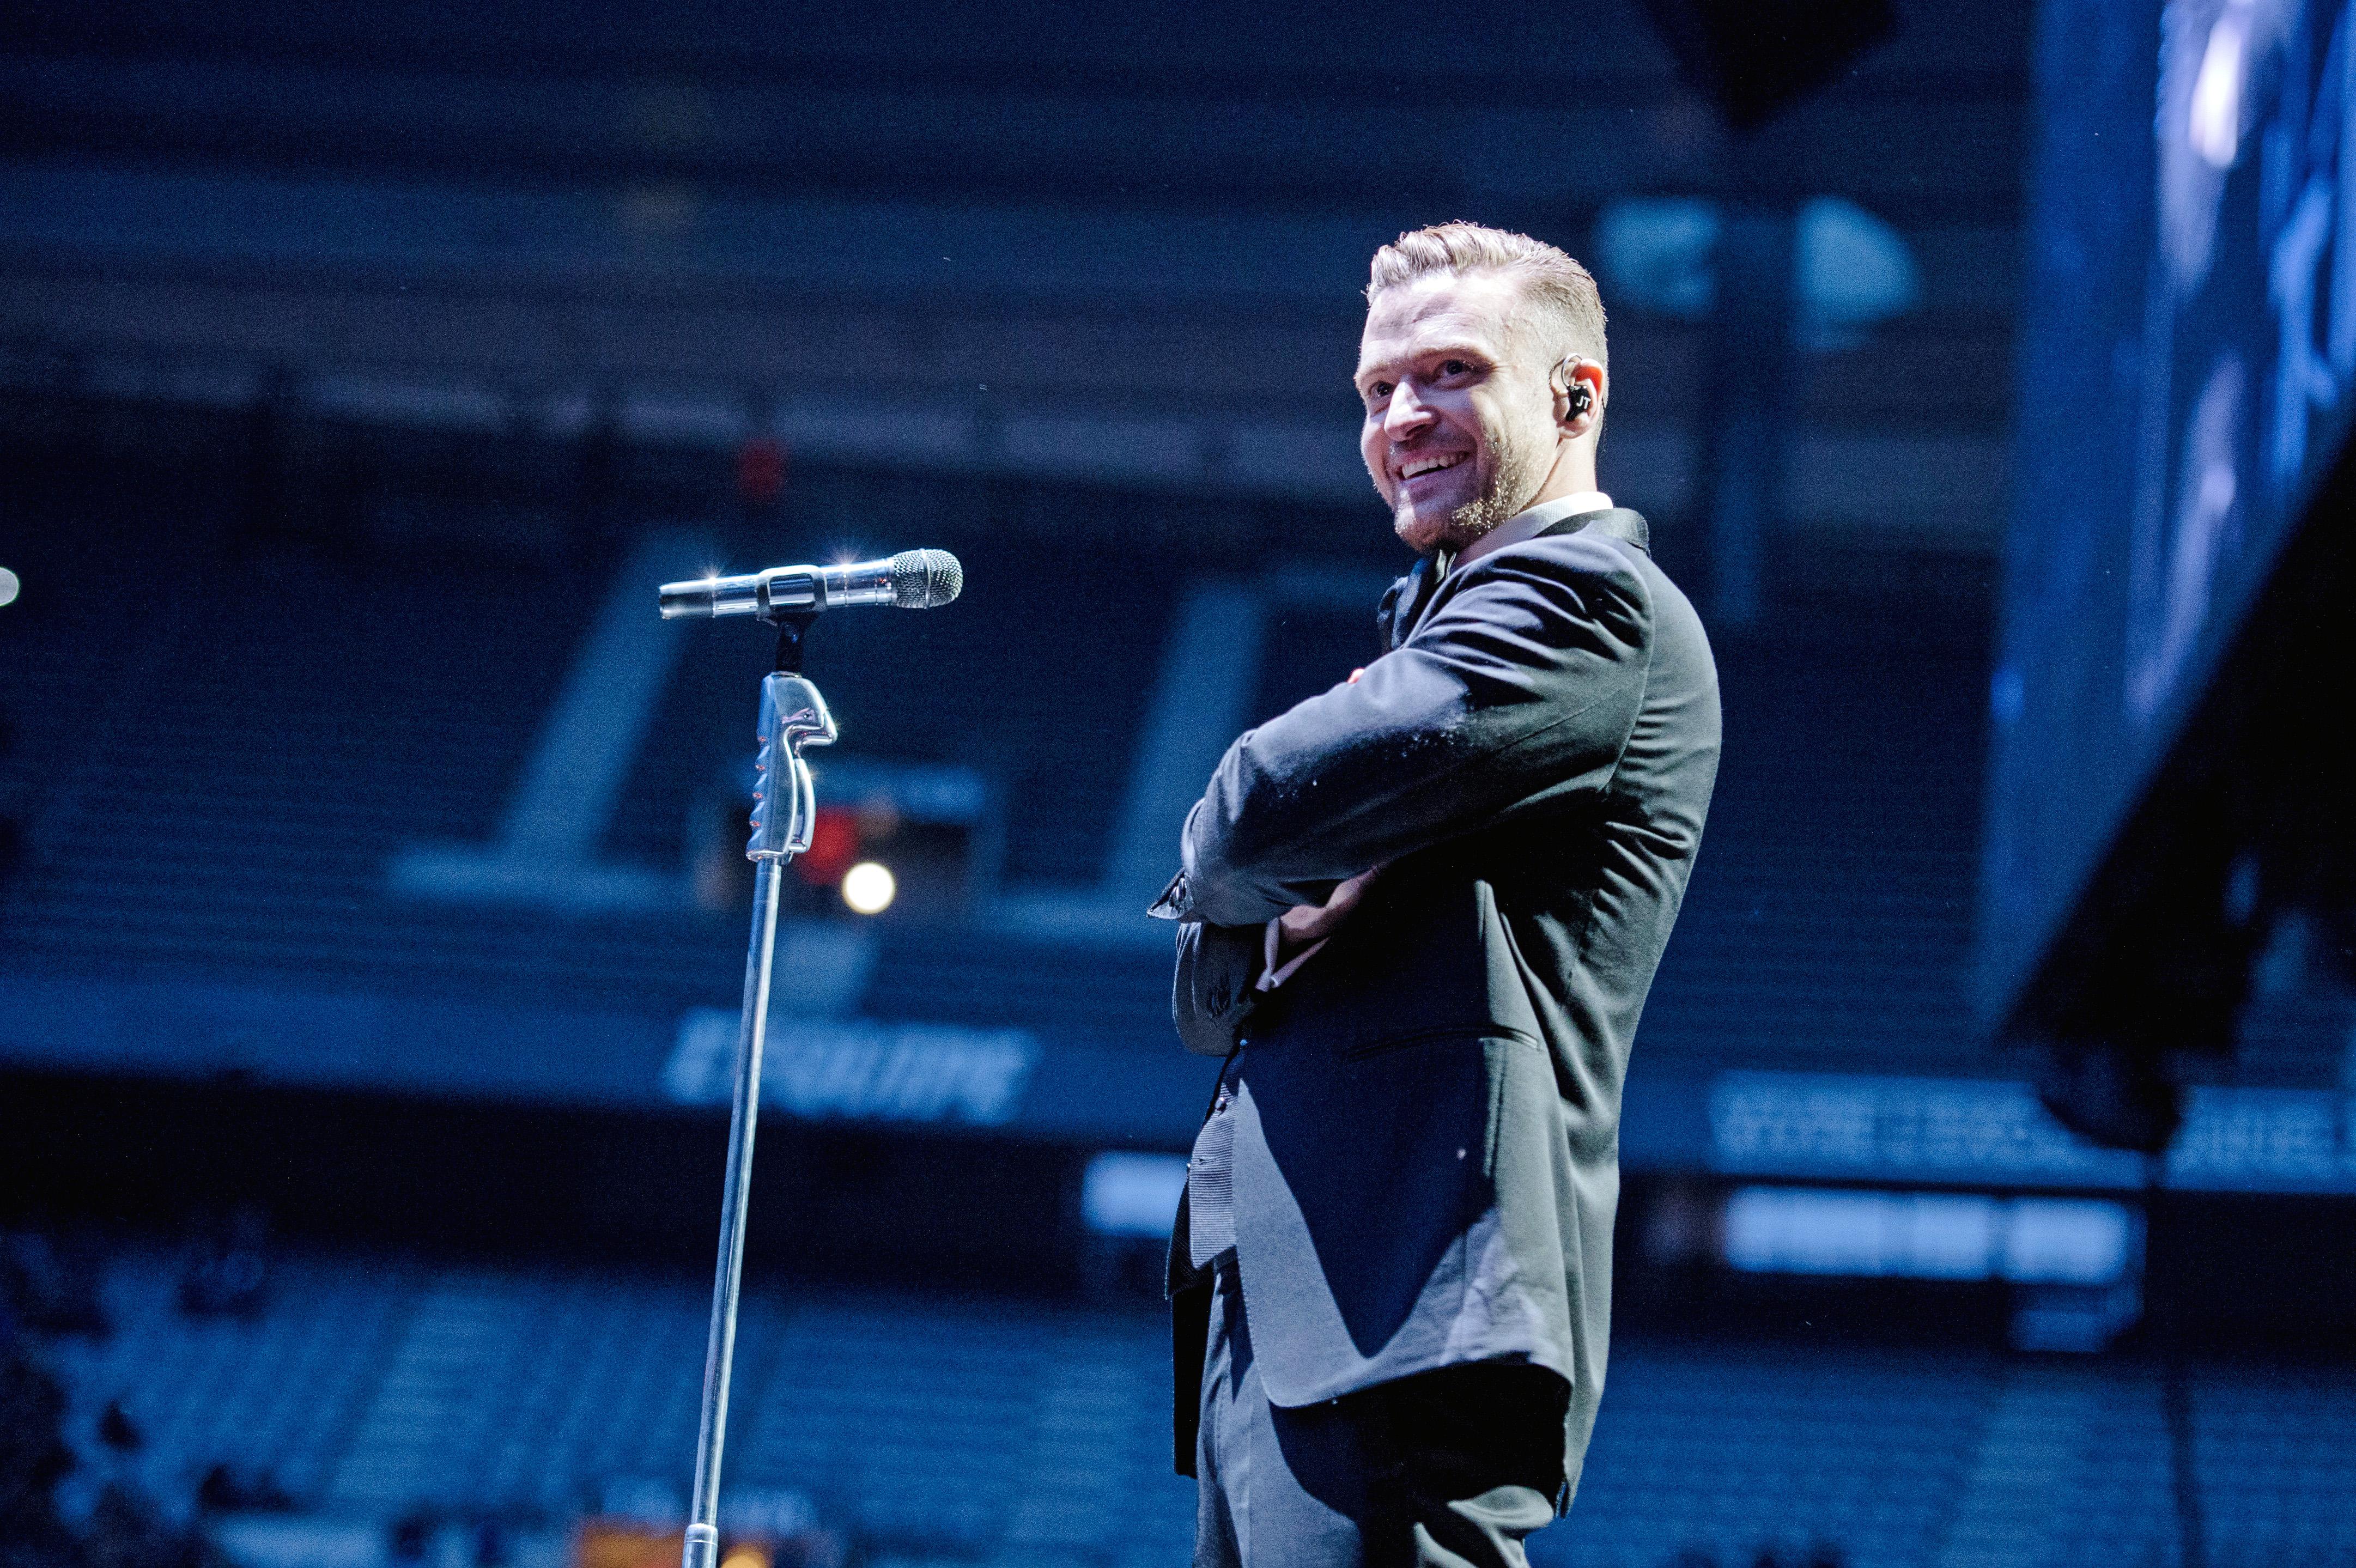 Justin Timberlake performs at Stade de France on April 26, 2014 in Paris.